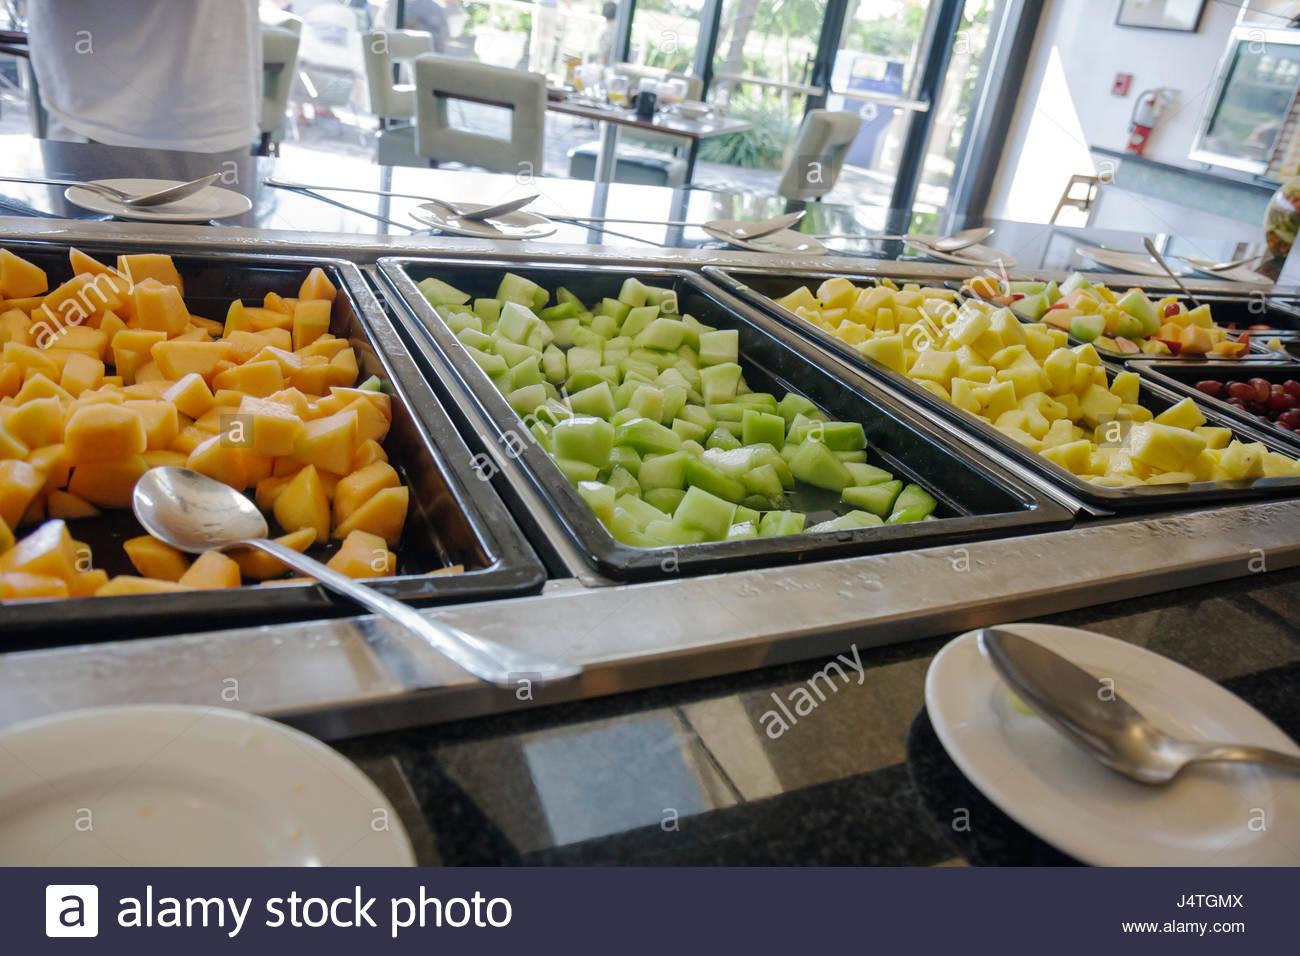 miami florida wyndham miami airport hotel lodging restaurant stock rh alamy com loews breakfast buffet miami breakfast buffet miami south beach